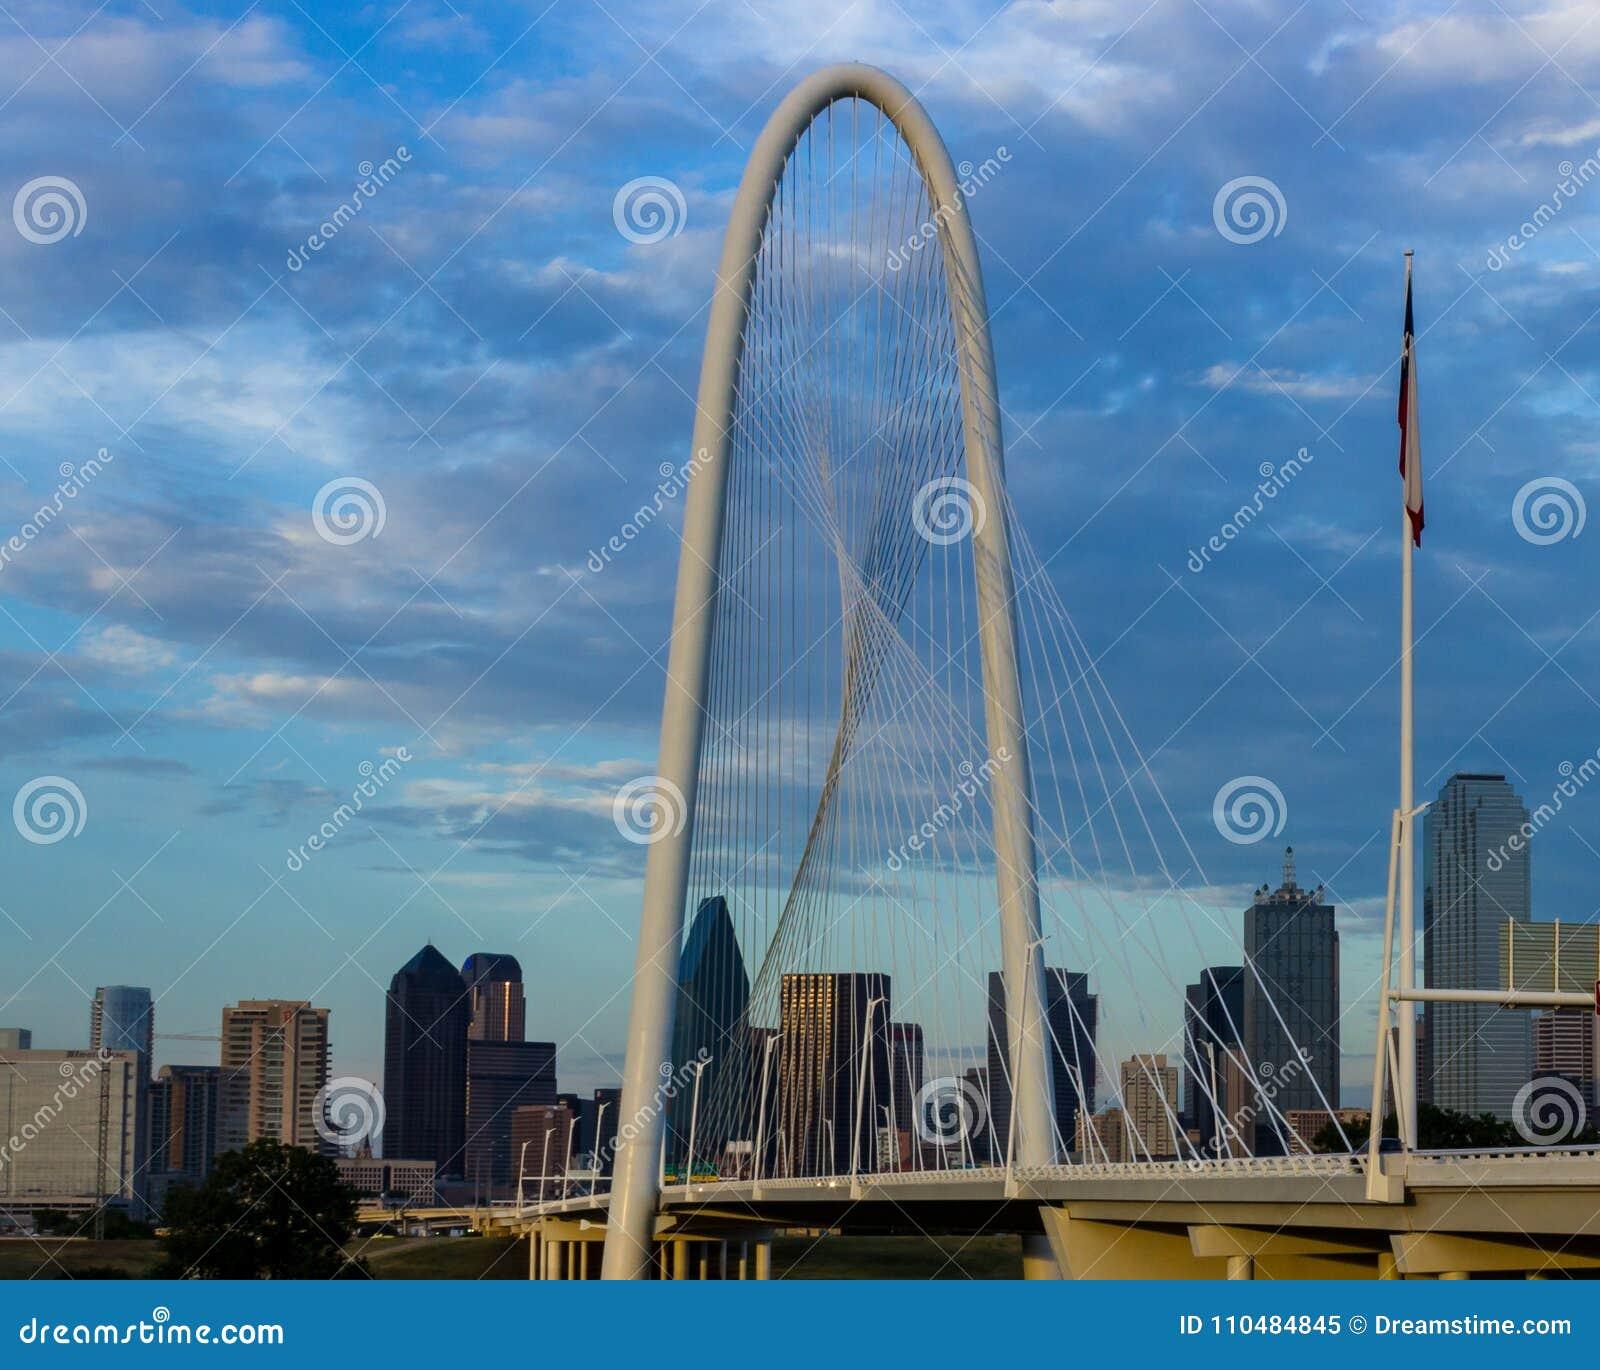 Margaret Hunt Hill Bridge com skyline de Dallas, Texas na parte traseira